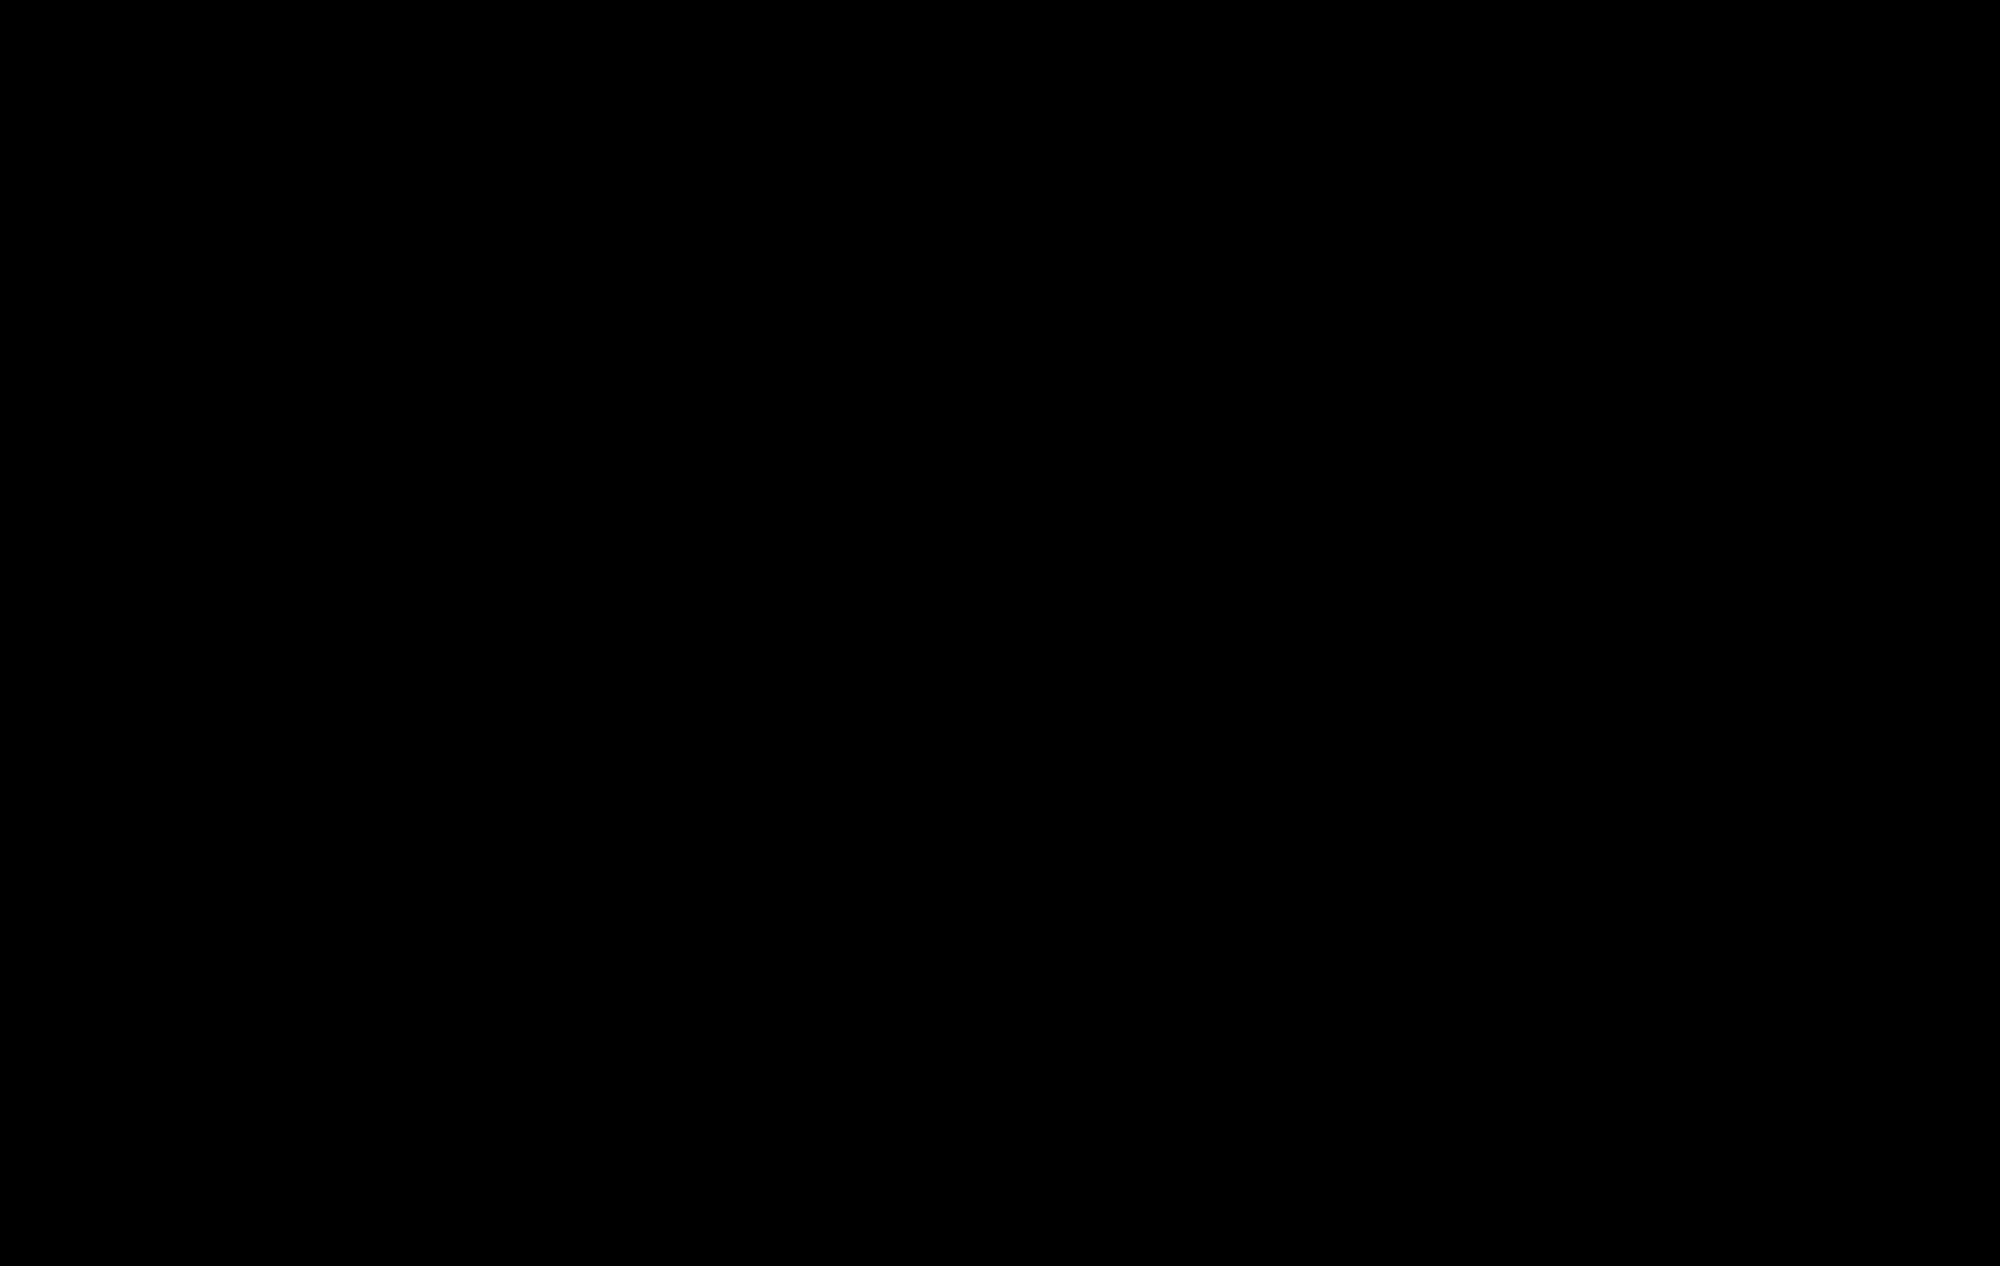 The Golden Section Sezione Aurea Leonardo Da Vinci Spirale Logaritmica